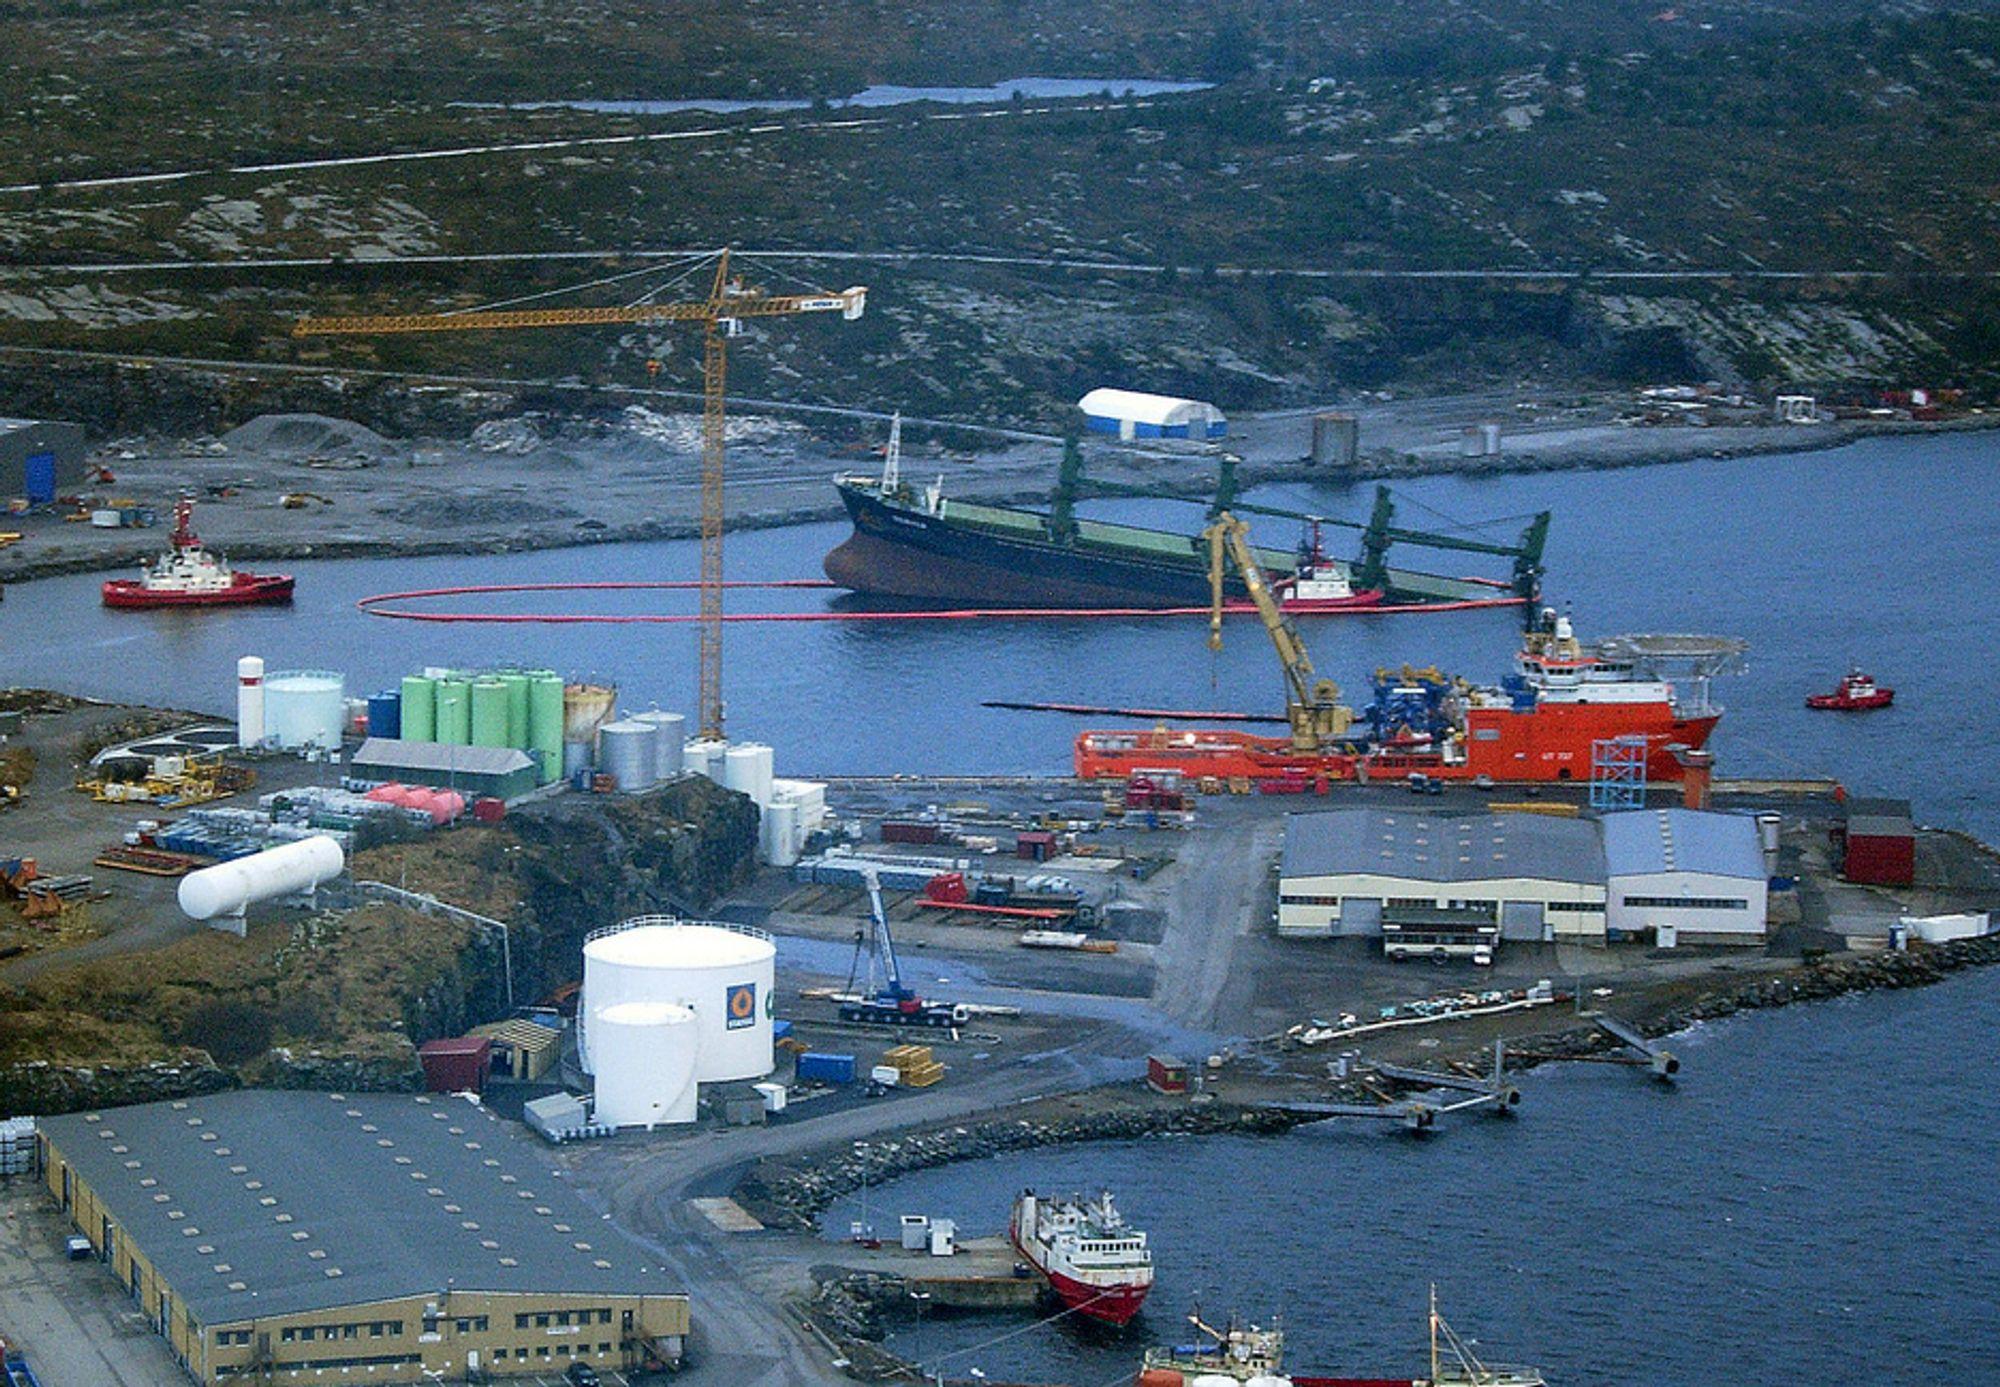 NØDLOSSES: Forskipet er landsatt på Ågotnes, hvor det er bedre vernet for vær og vind. I dag skal det nødlosses.